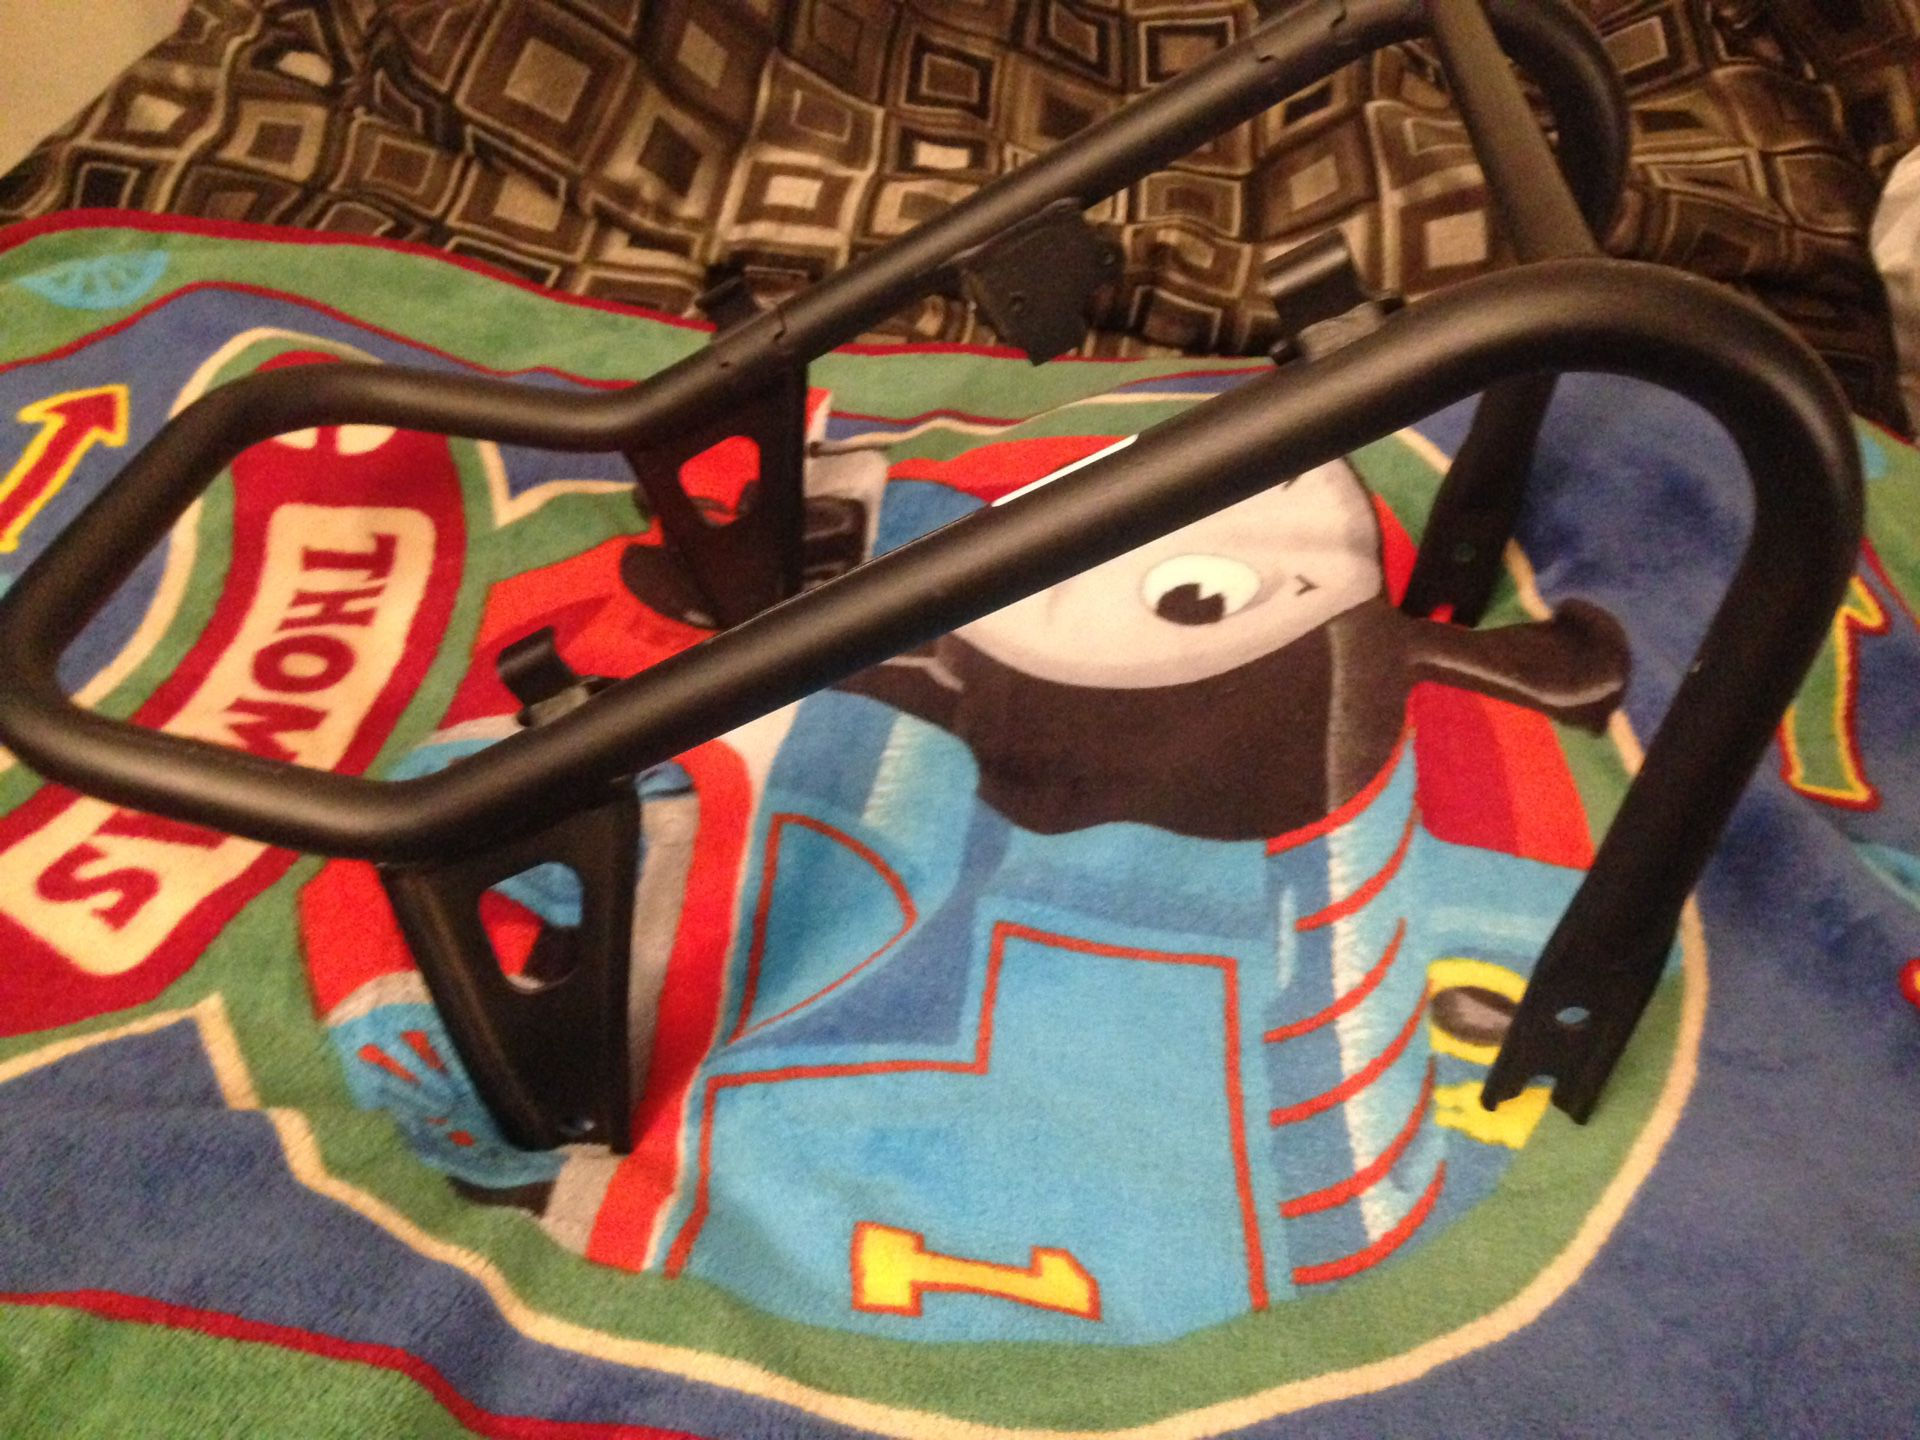 Honda ruckus seat frame brand new 🛵🛵🛵🛵🛵🛵🛵🛵🛵